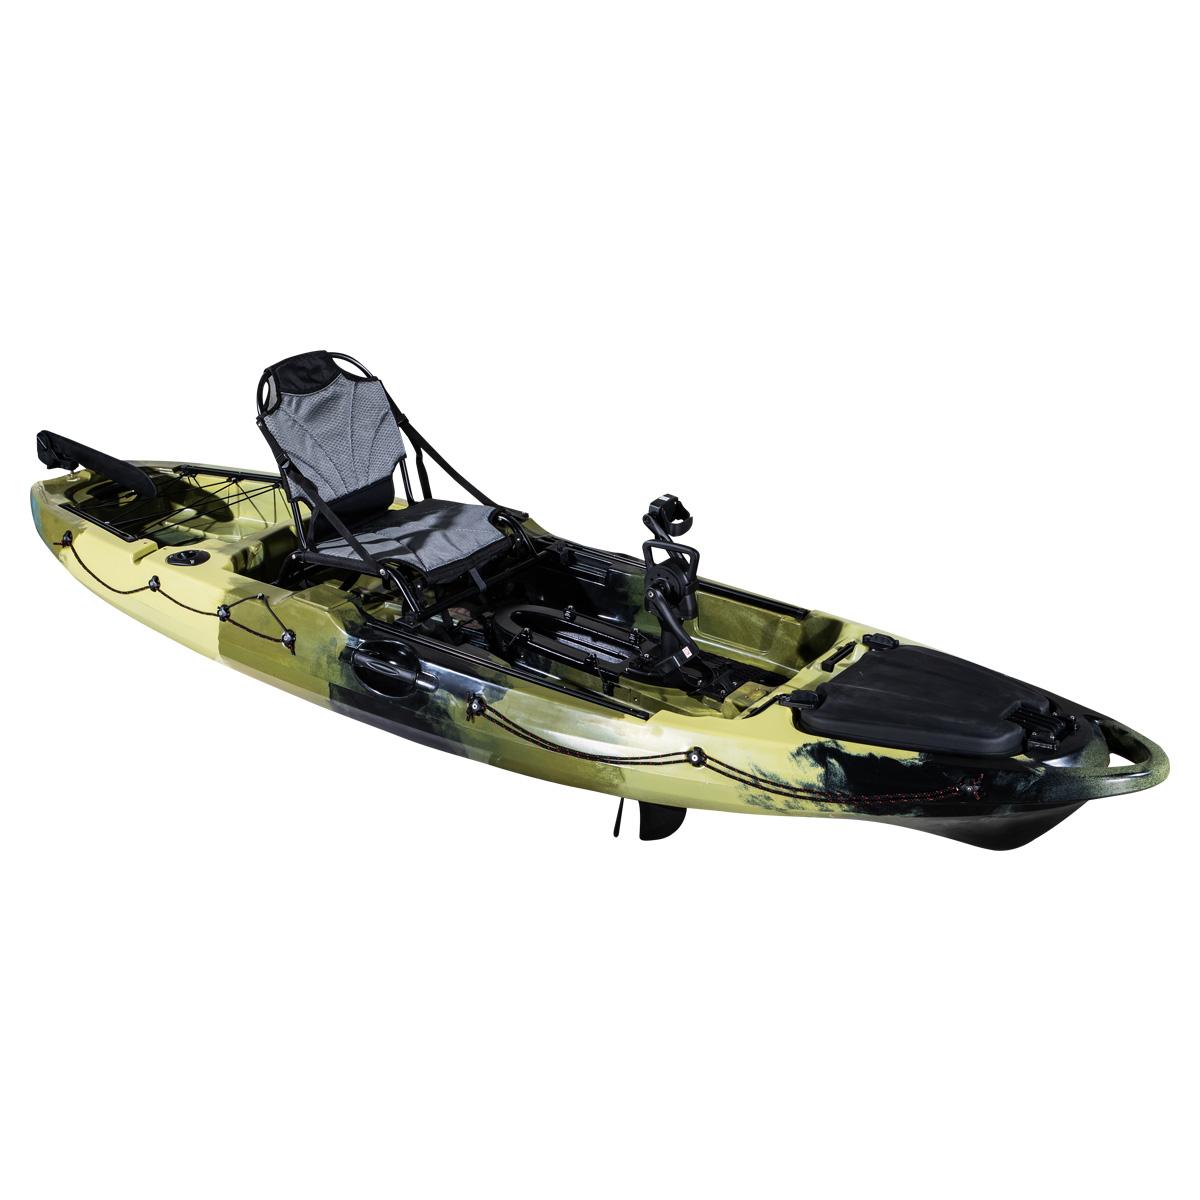 Revolve 10 Pedal Fishing Kayak Army Camo